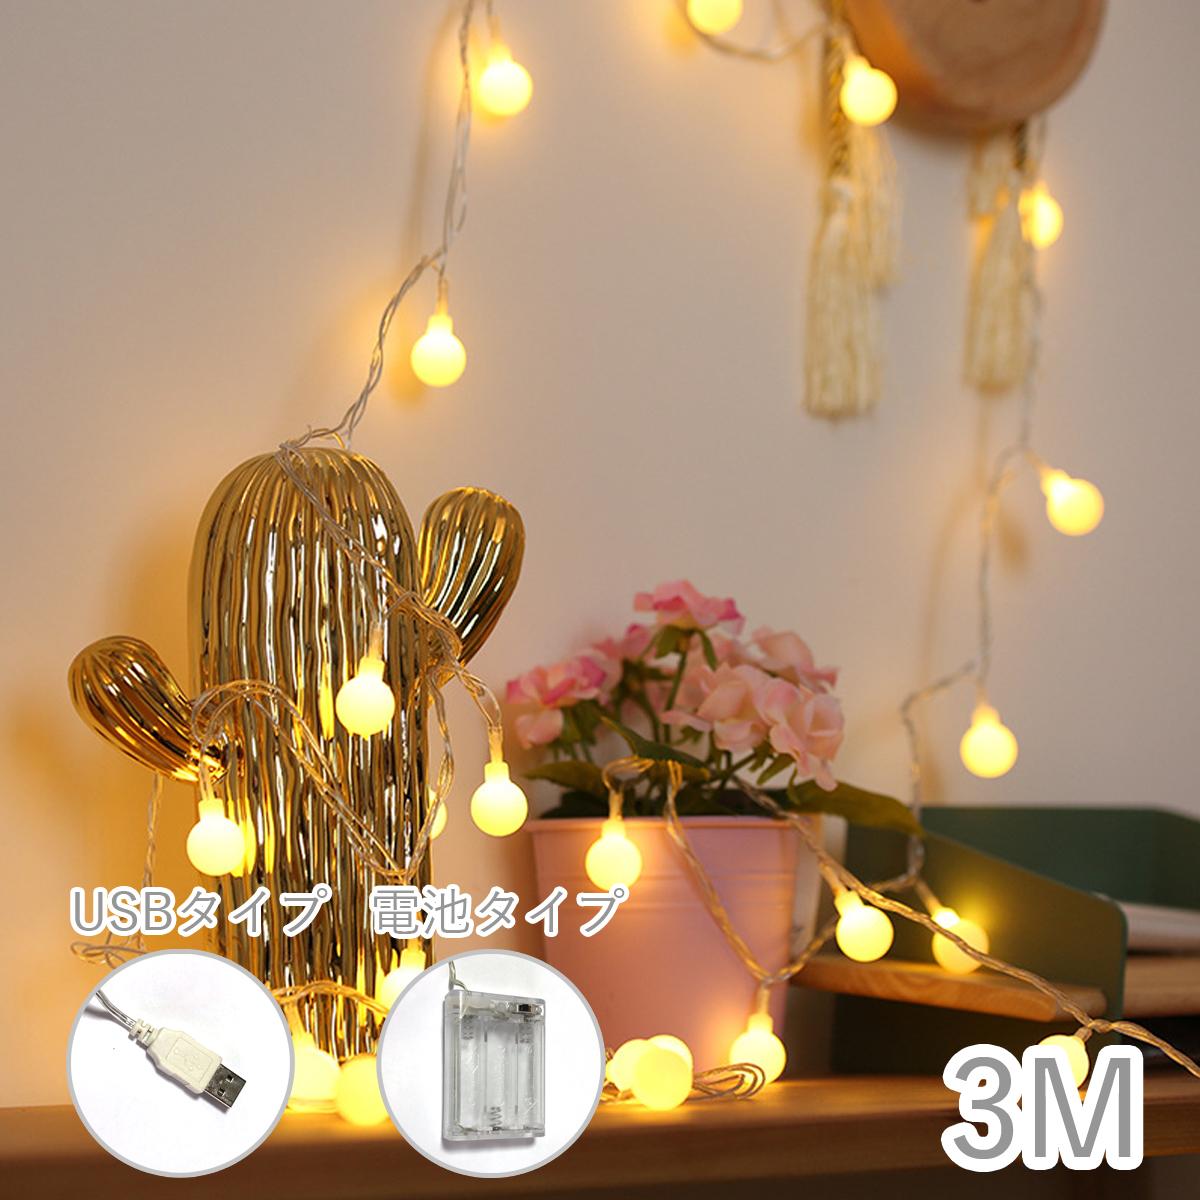 LEDボールライト 3m